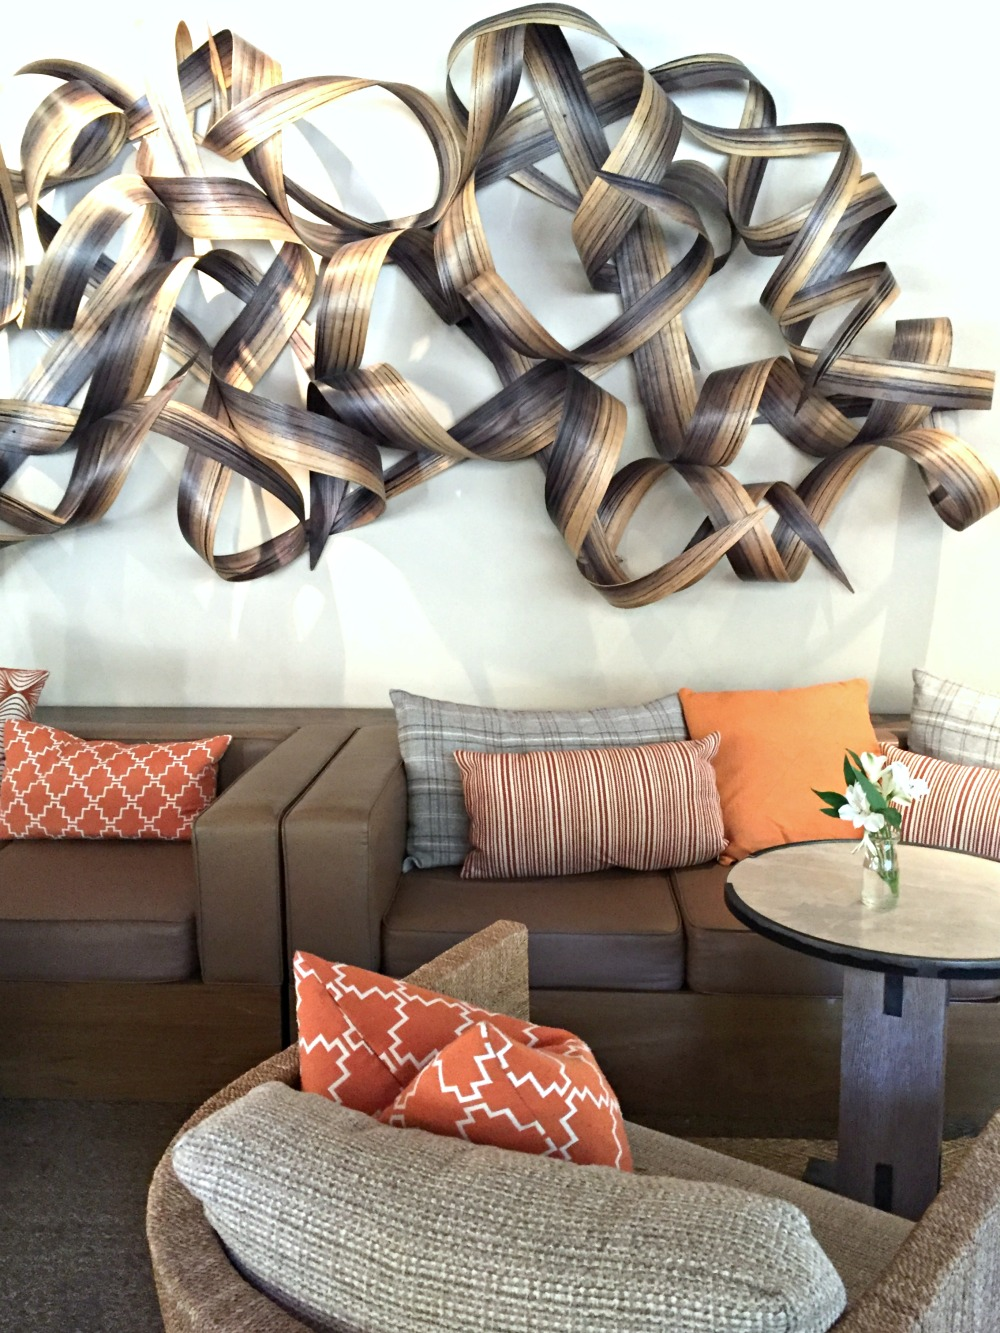 michaels-makers-summit-2016-carmel-valley-ranch-veneer-swirl-wall-art